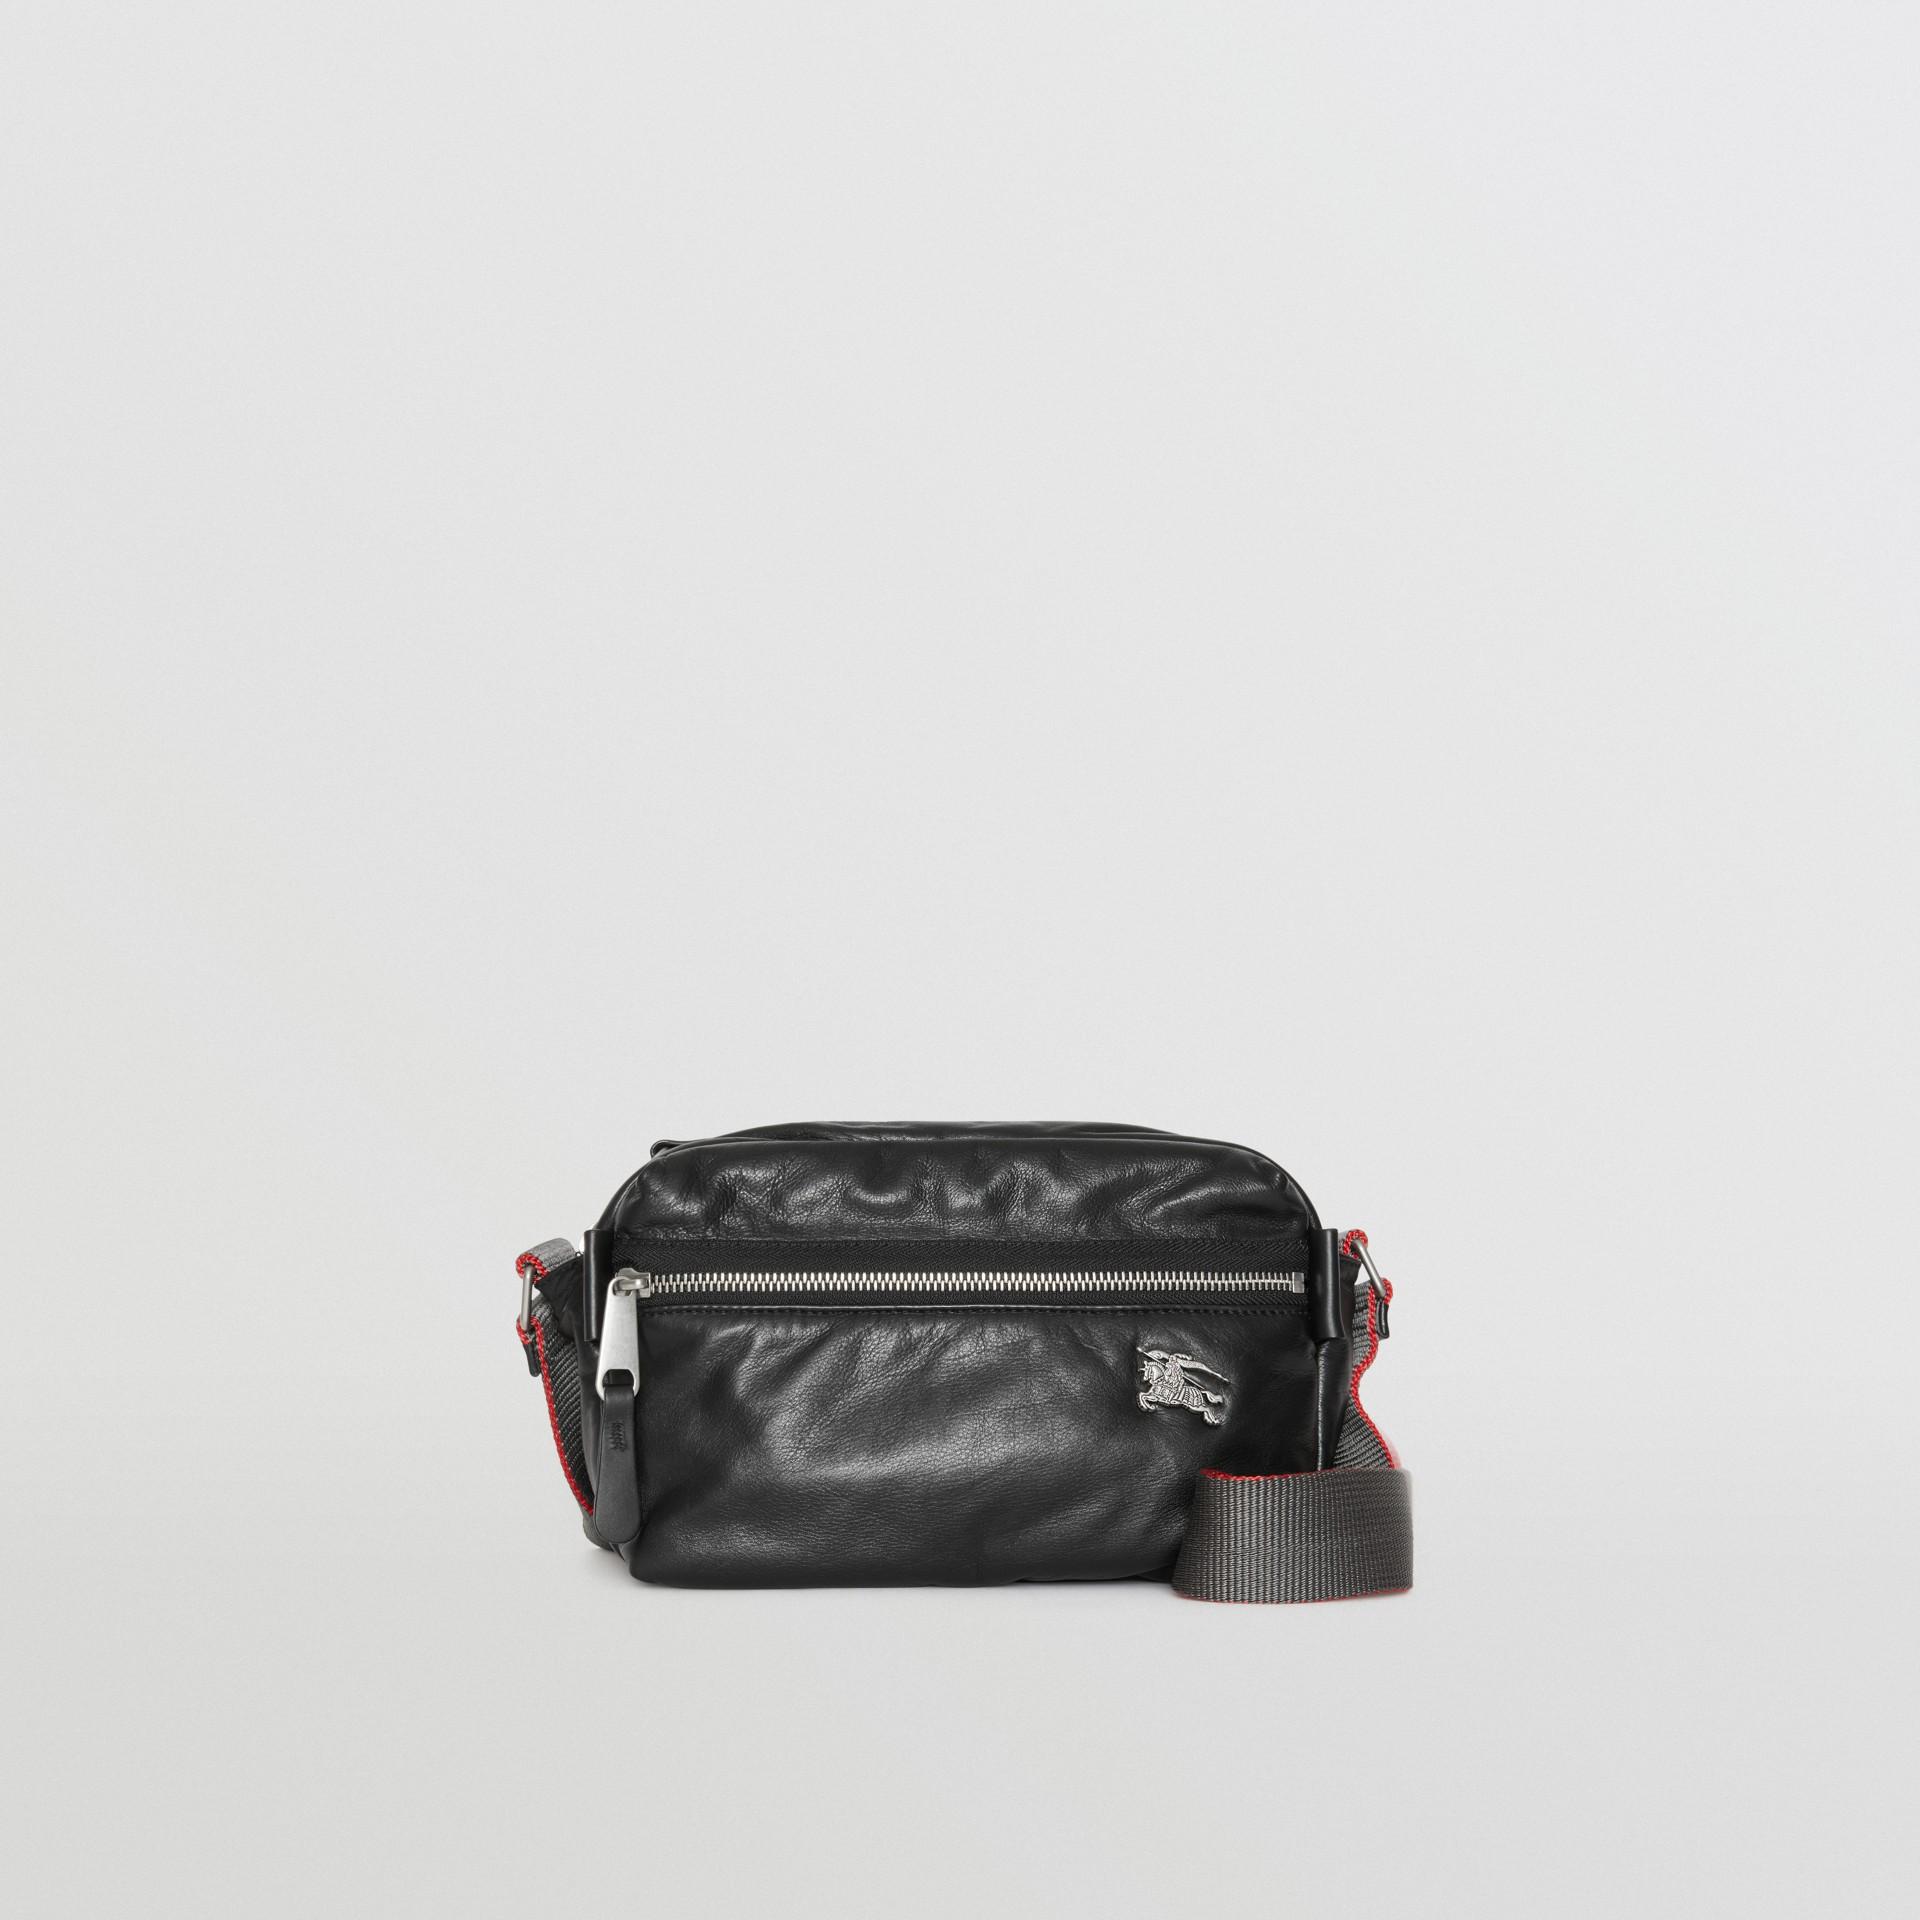 EKD Nappa Leather Crossbody Bag in Black - Men | Burberry Hong Kong - gallery image 0